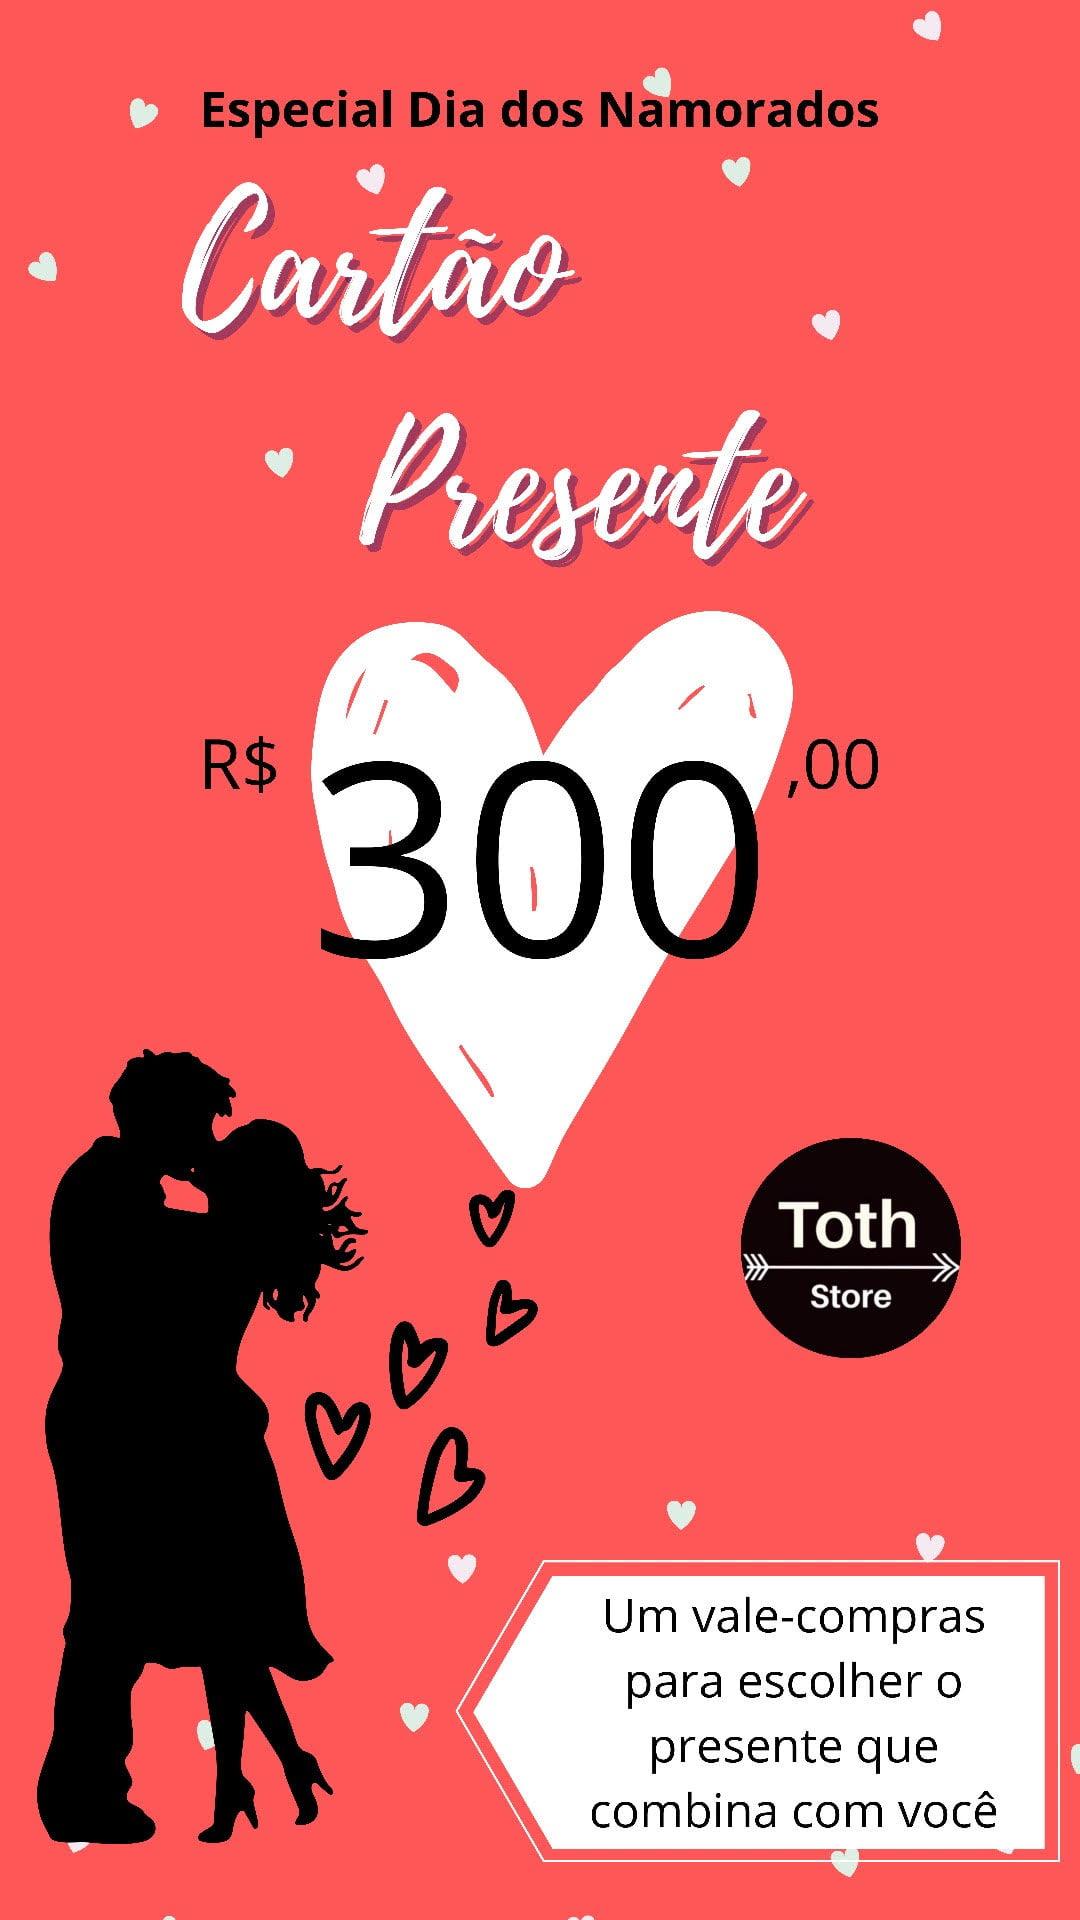 CARTÃO VALE PRESENTE R$ 300,00